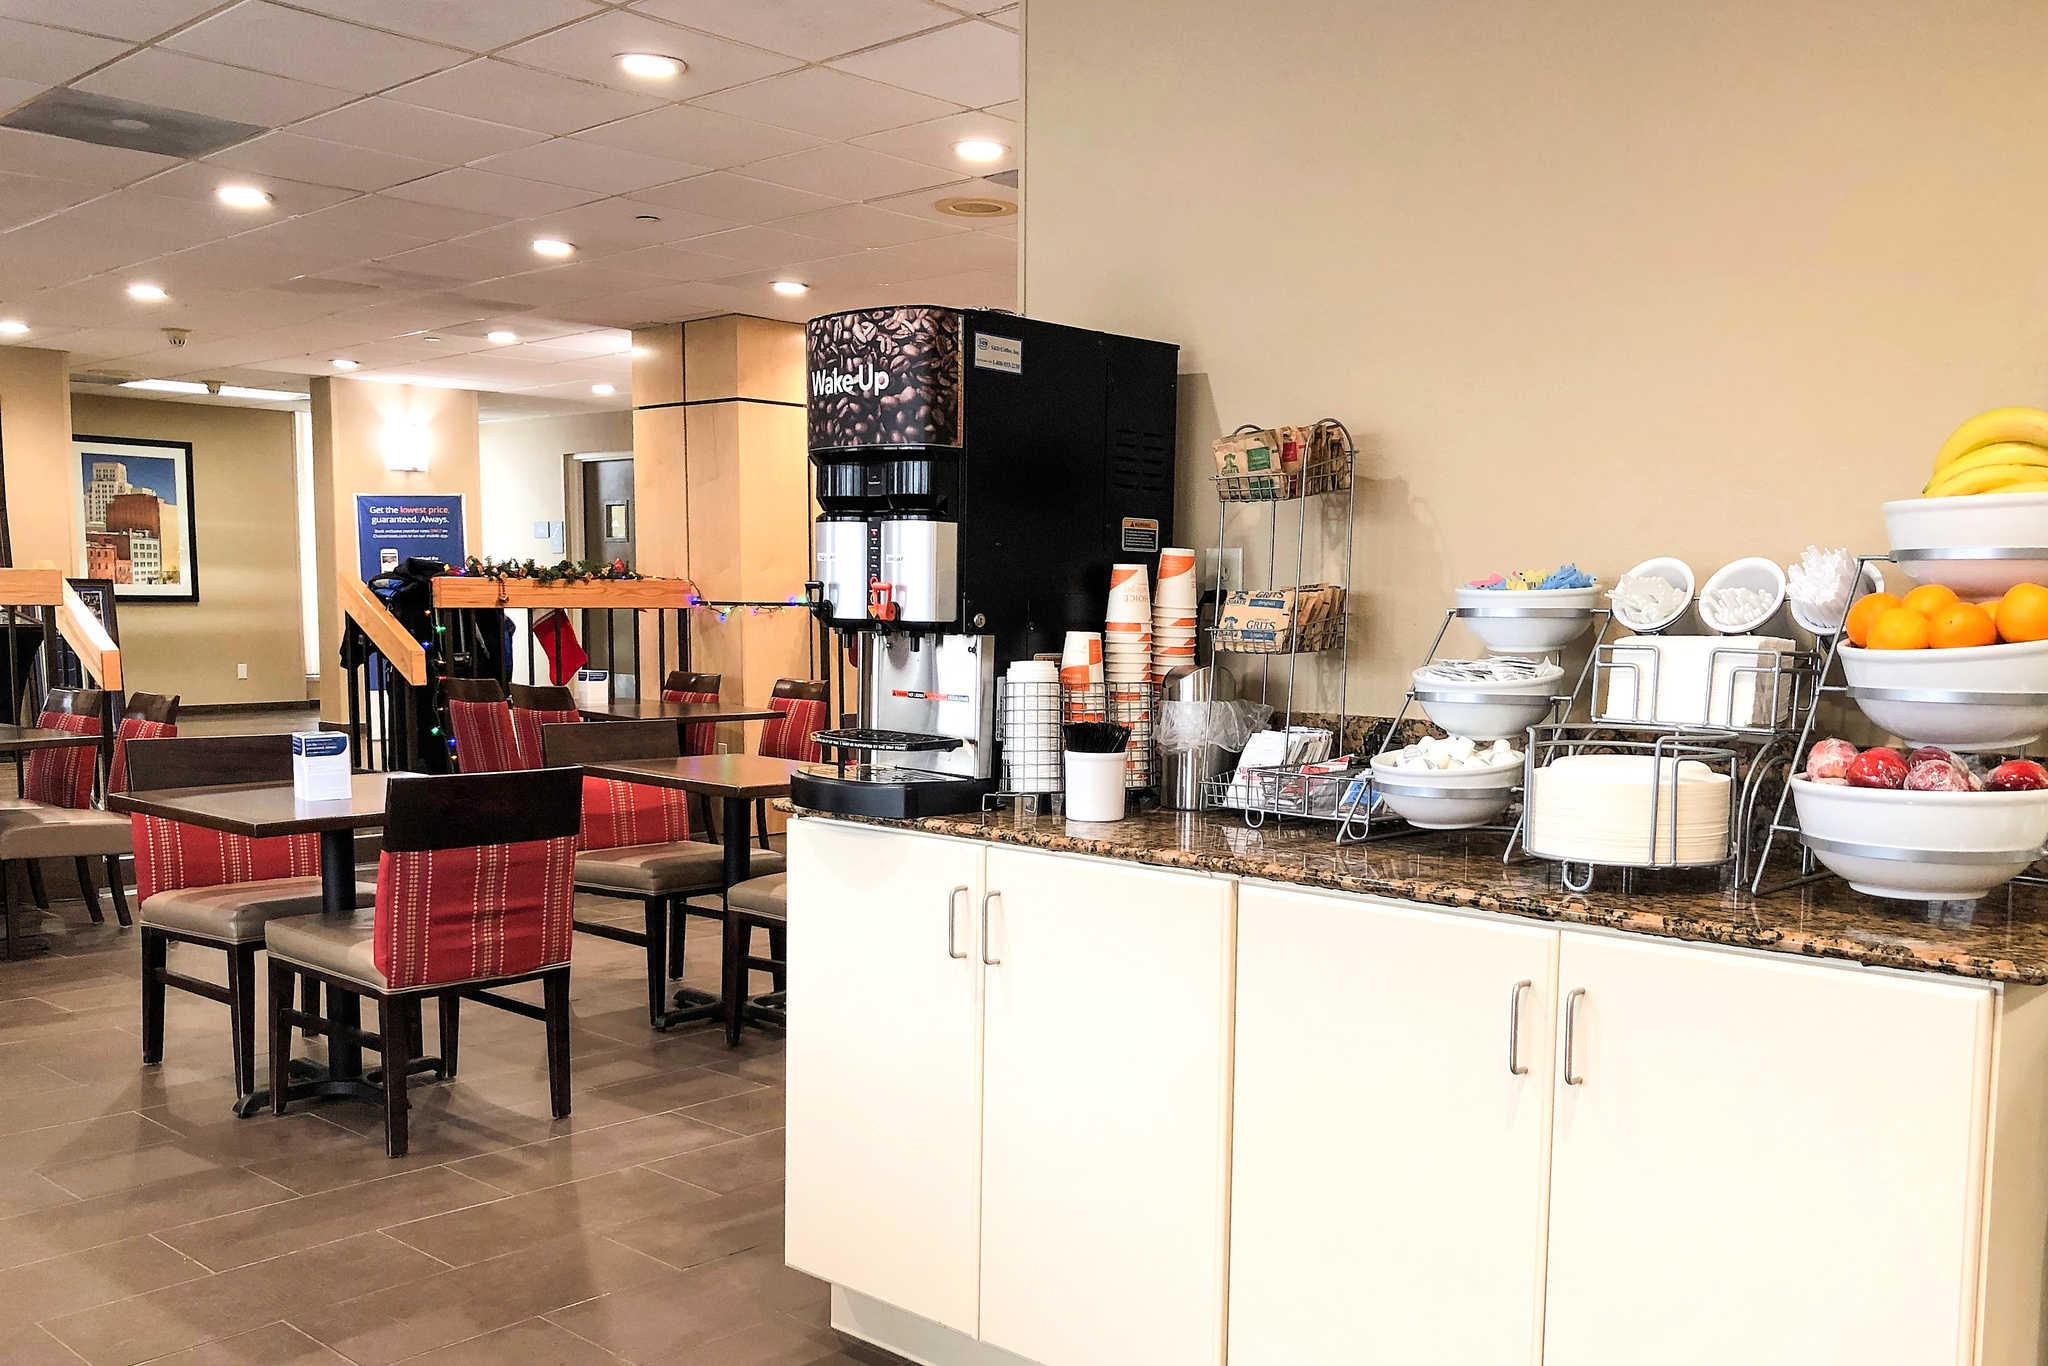 Comfort Inn & Suites Duke University-Downtown image 29